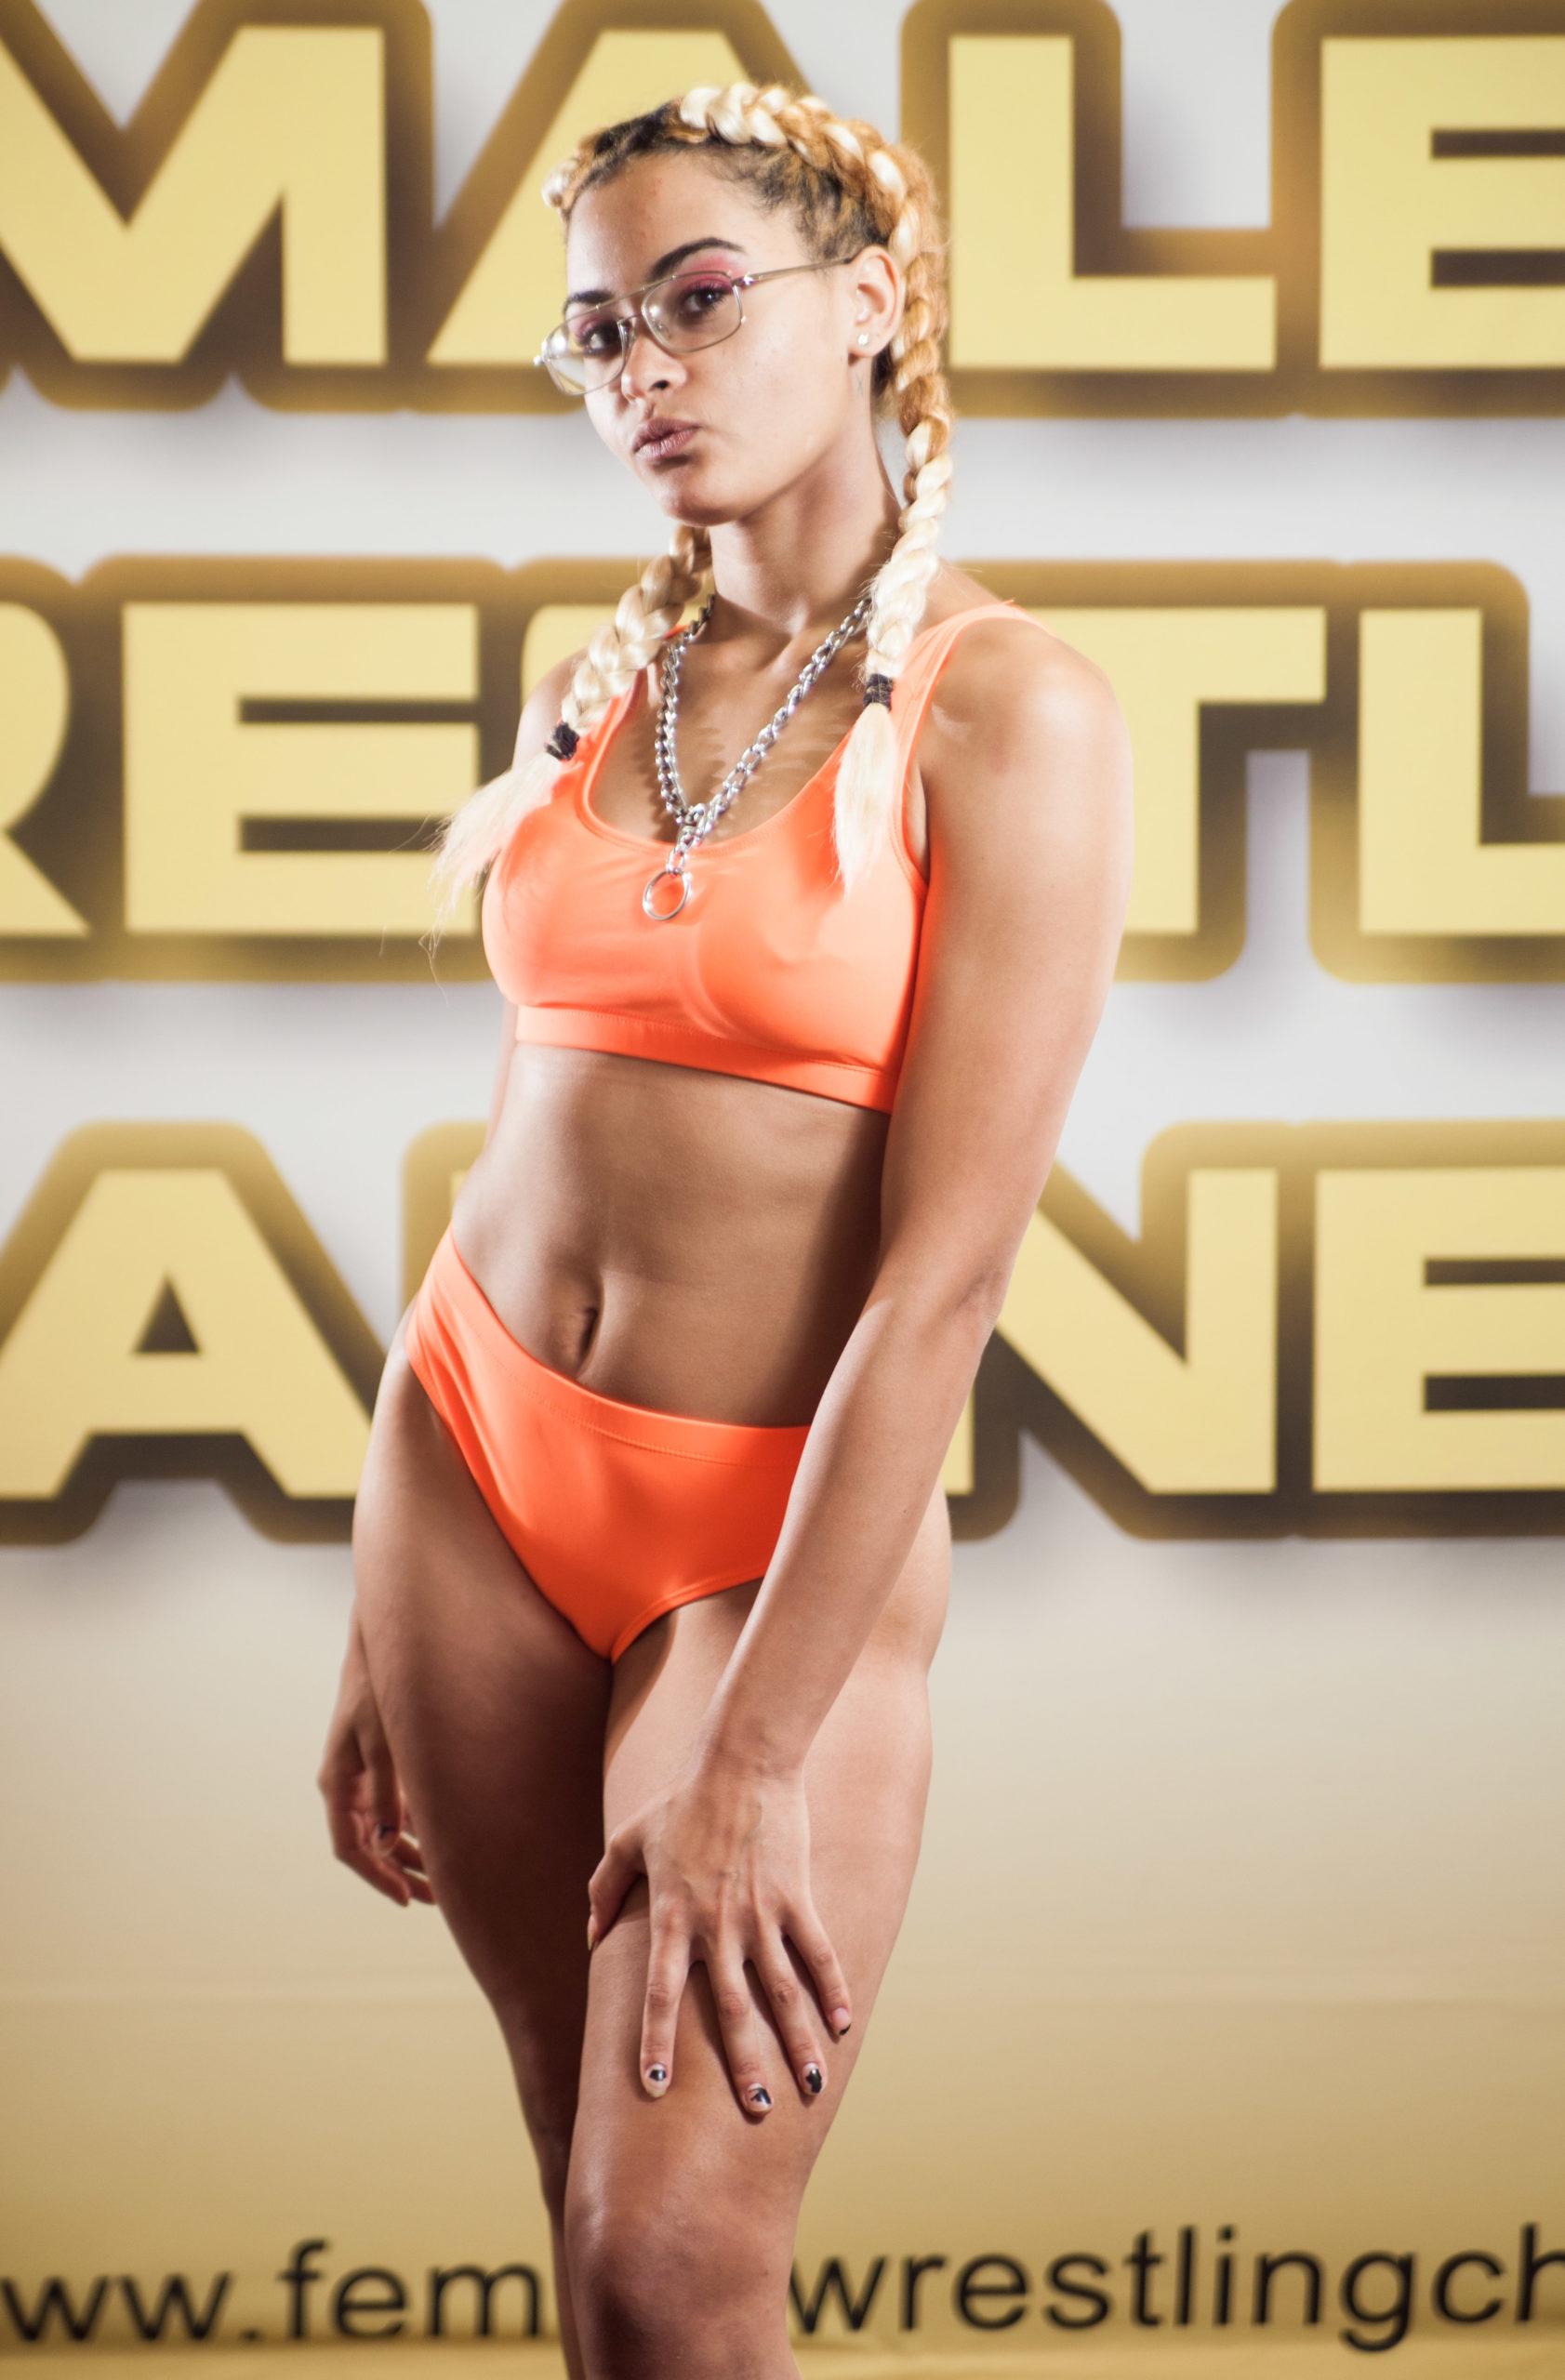 Rose Risque - Women Wrestling - 2019